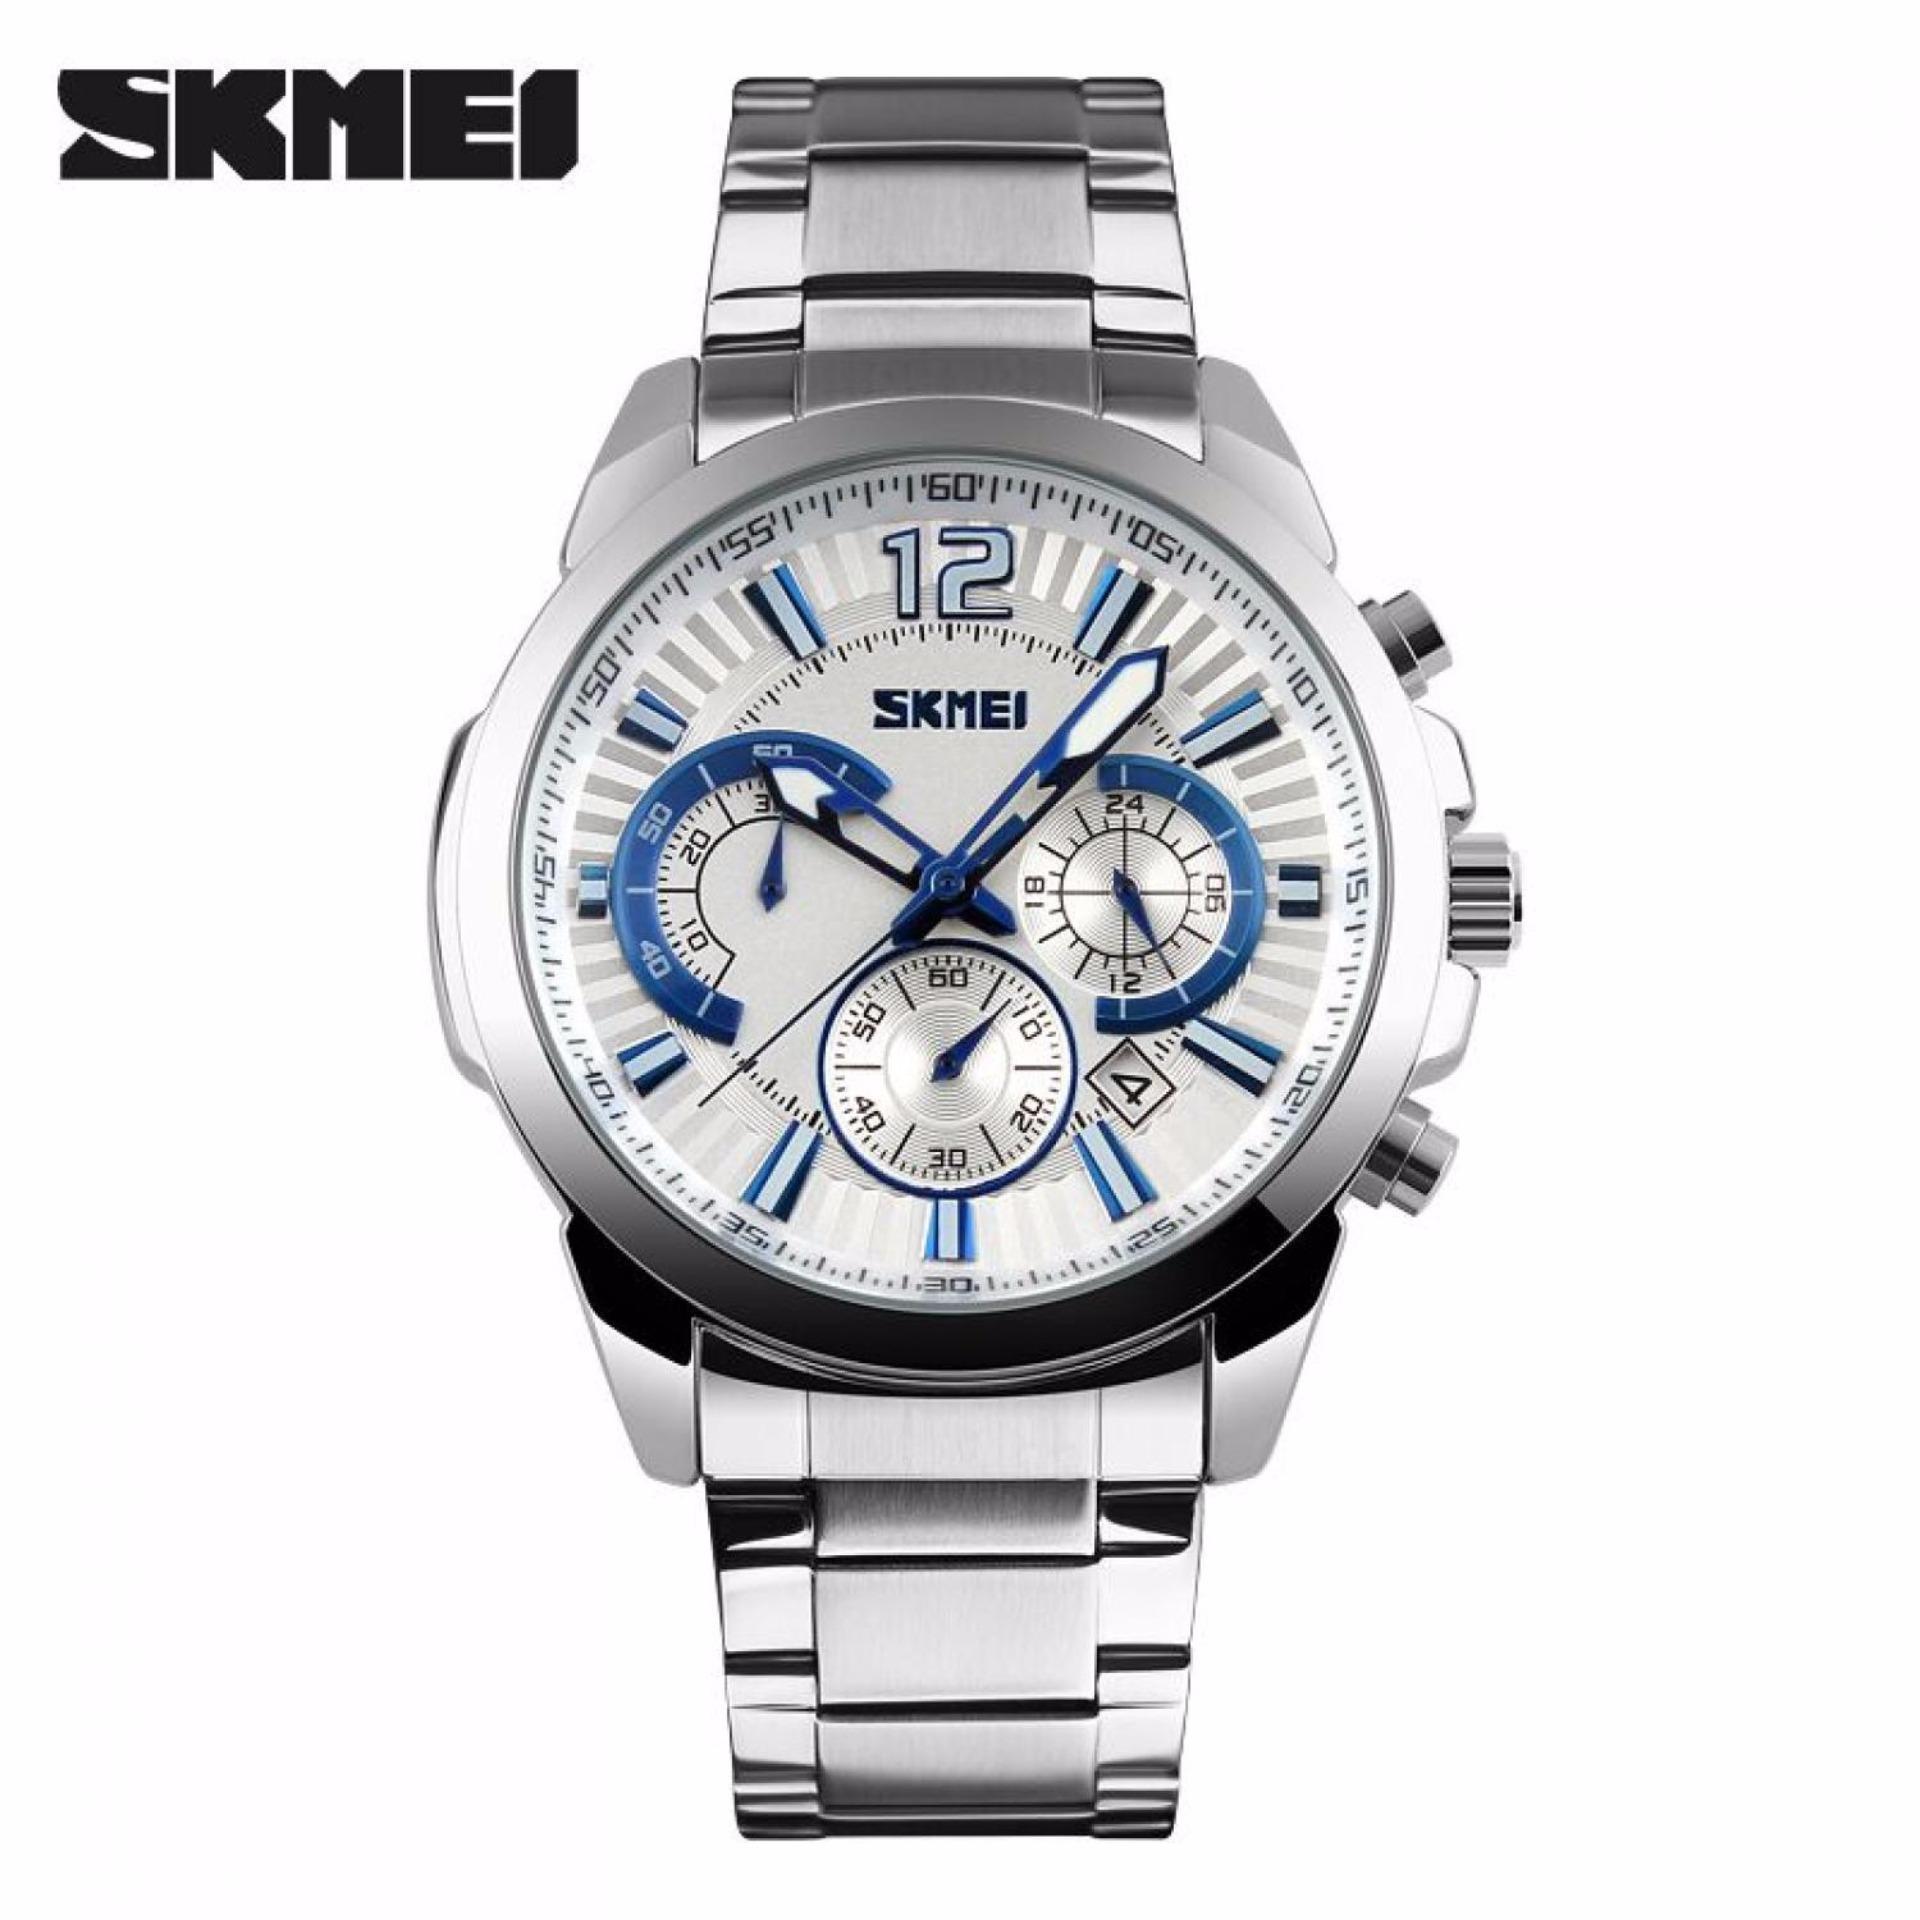 Promo Skmei Jam Tangan Analog Pria 9108Cs Jam Tangan Pria Chronograph Chrono Watches Day Date Silver Putih Sulawesi Selatan